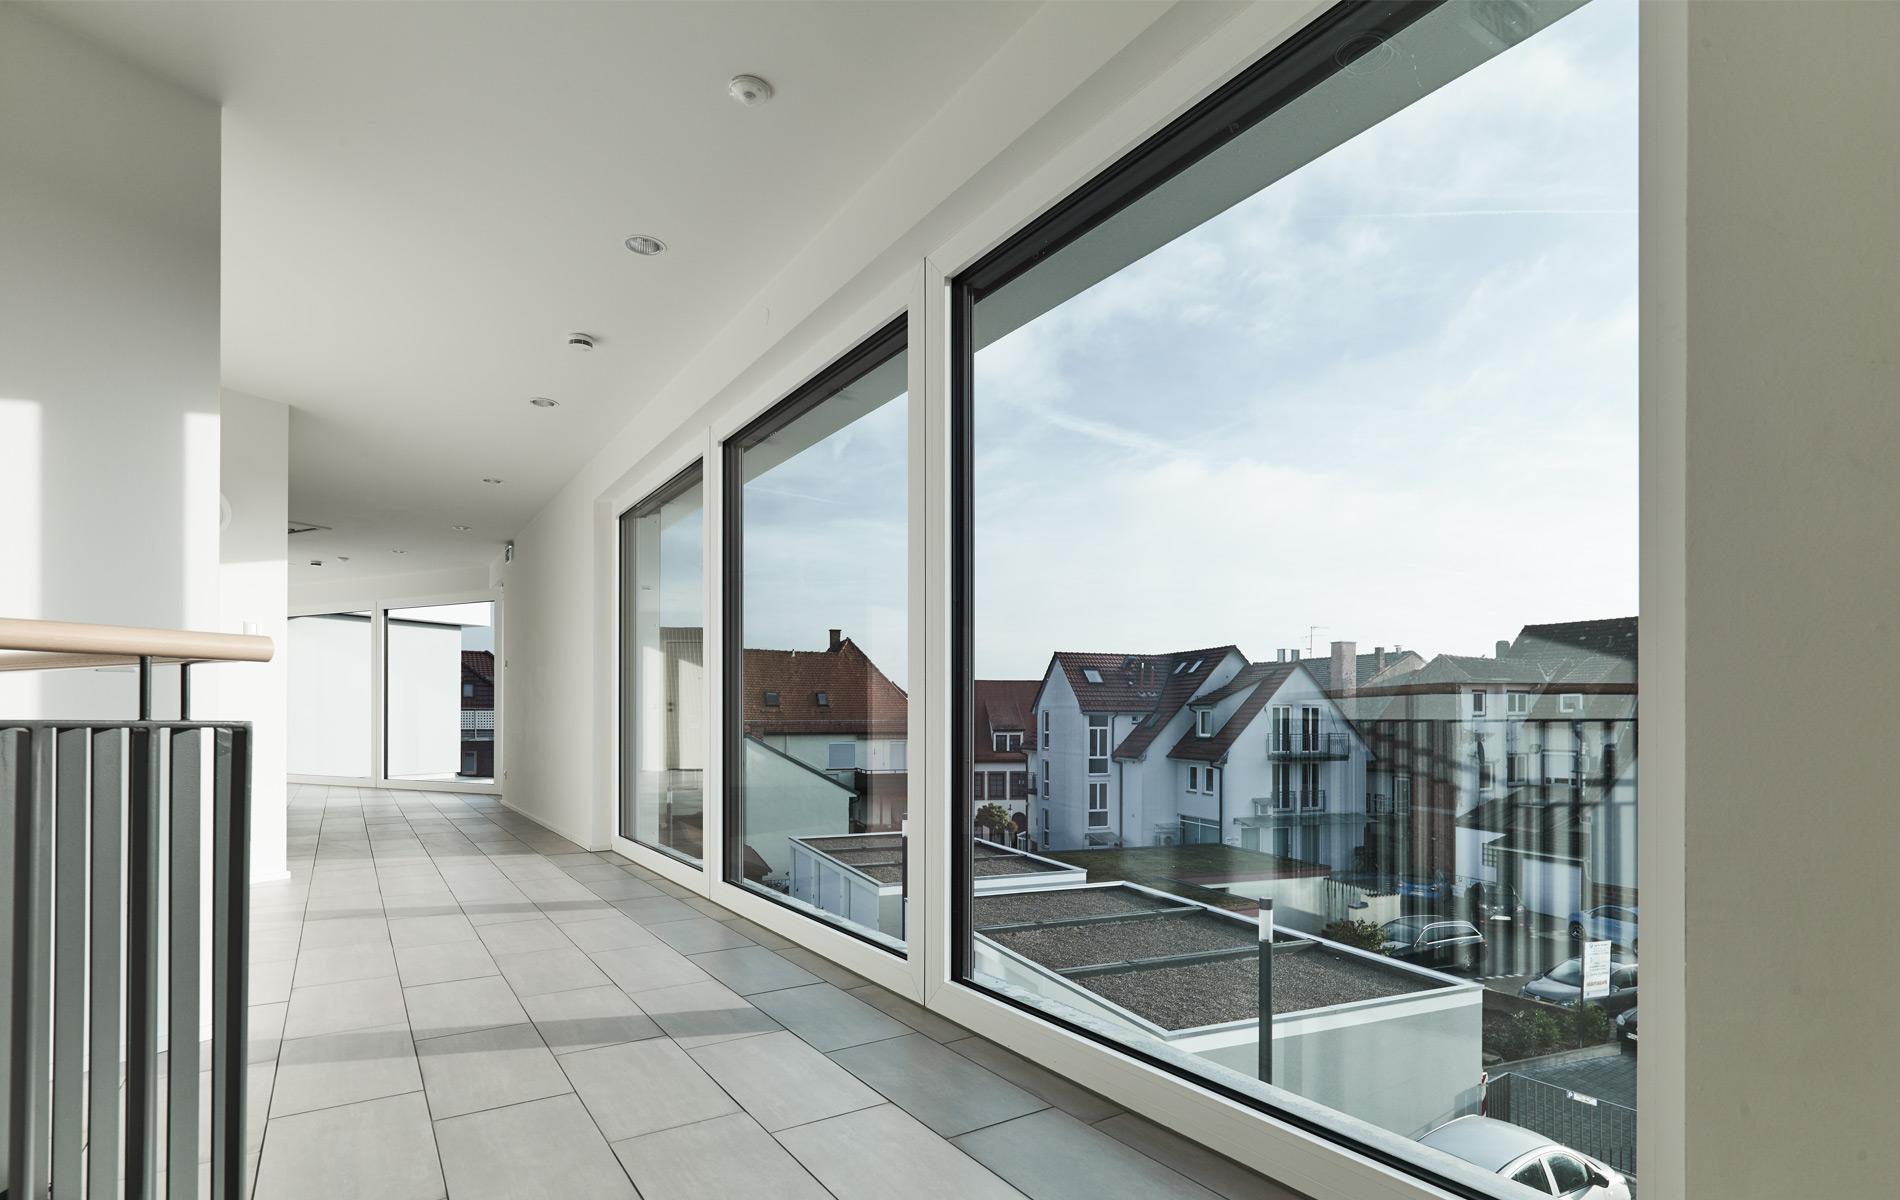 Kunststoff Alu Fenster Lebsack und Söhne